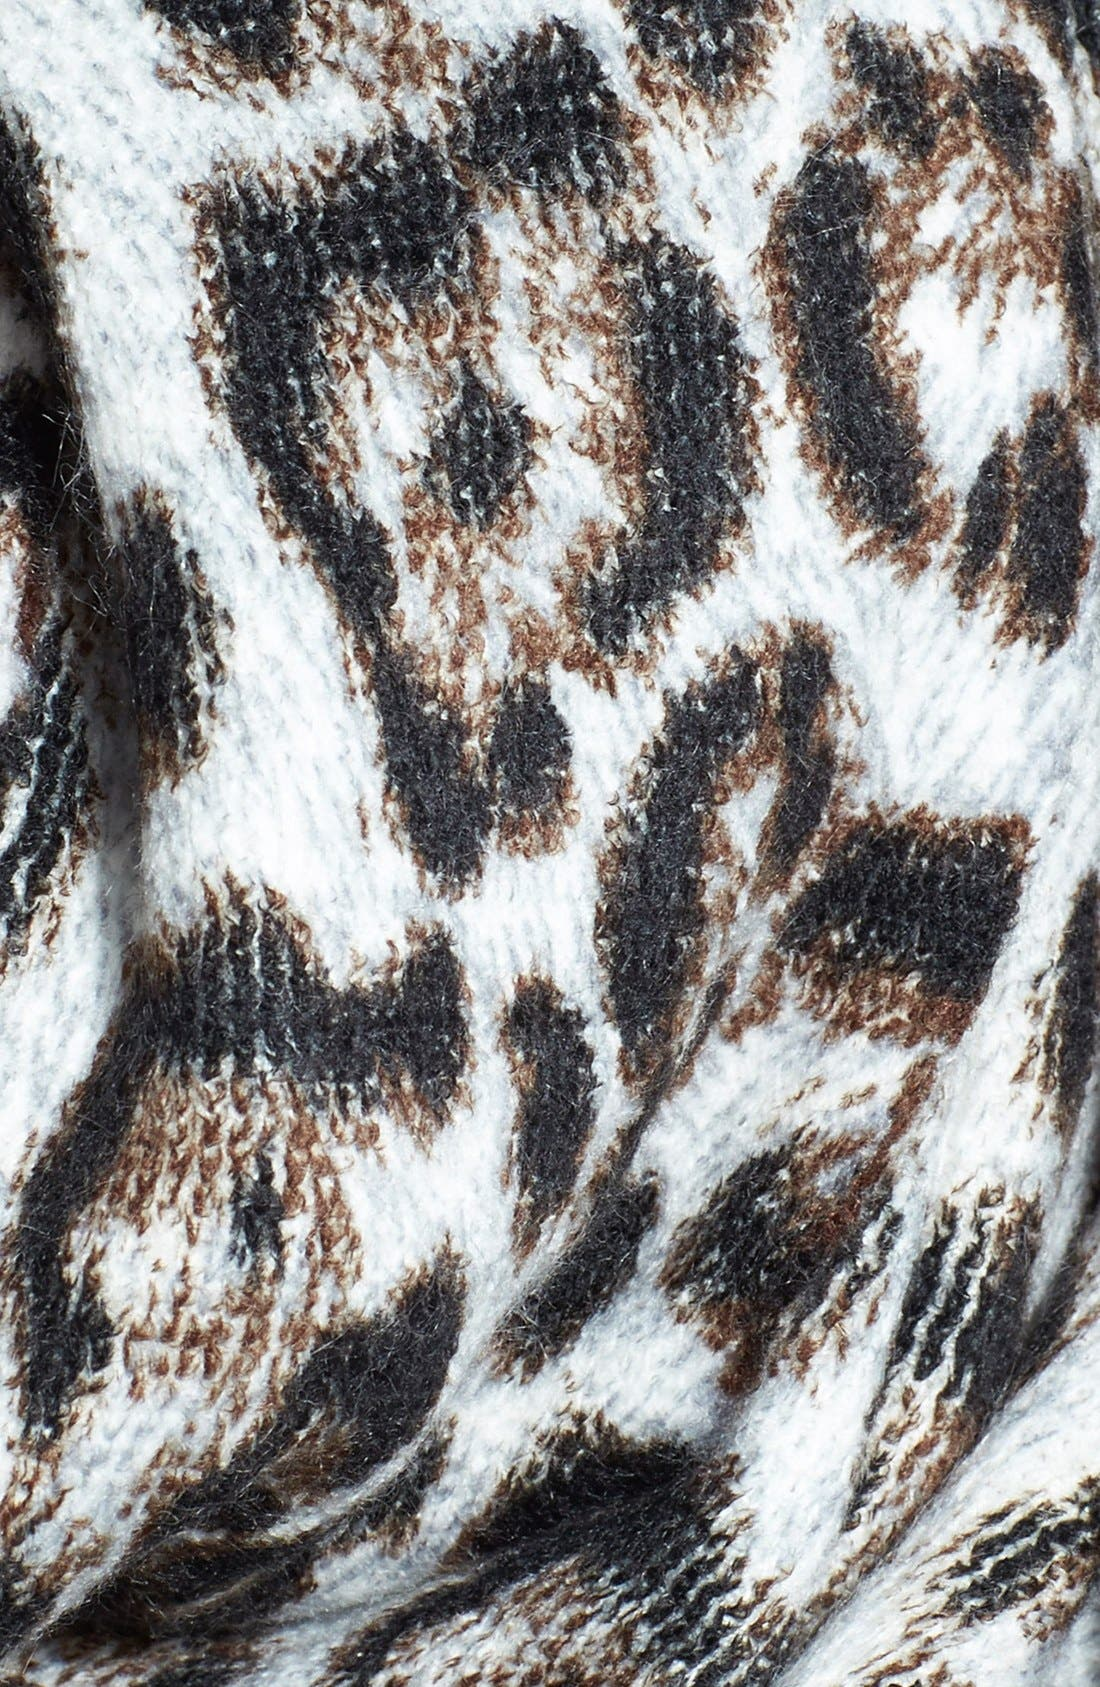 'Mowani' Leopard Print Infinity Scarf,                             Alternate thumbnail 2, color,                             250